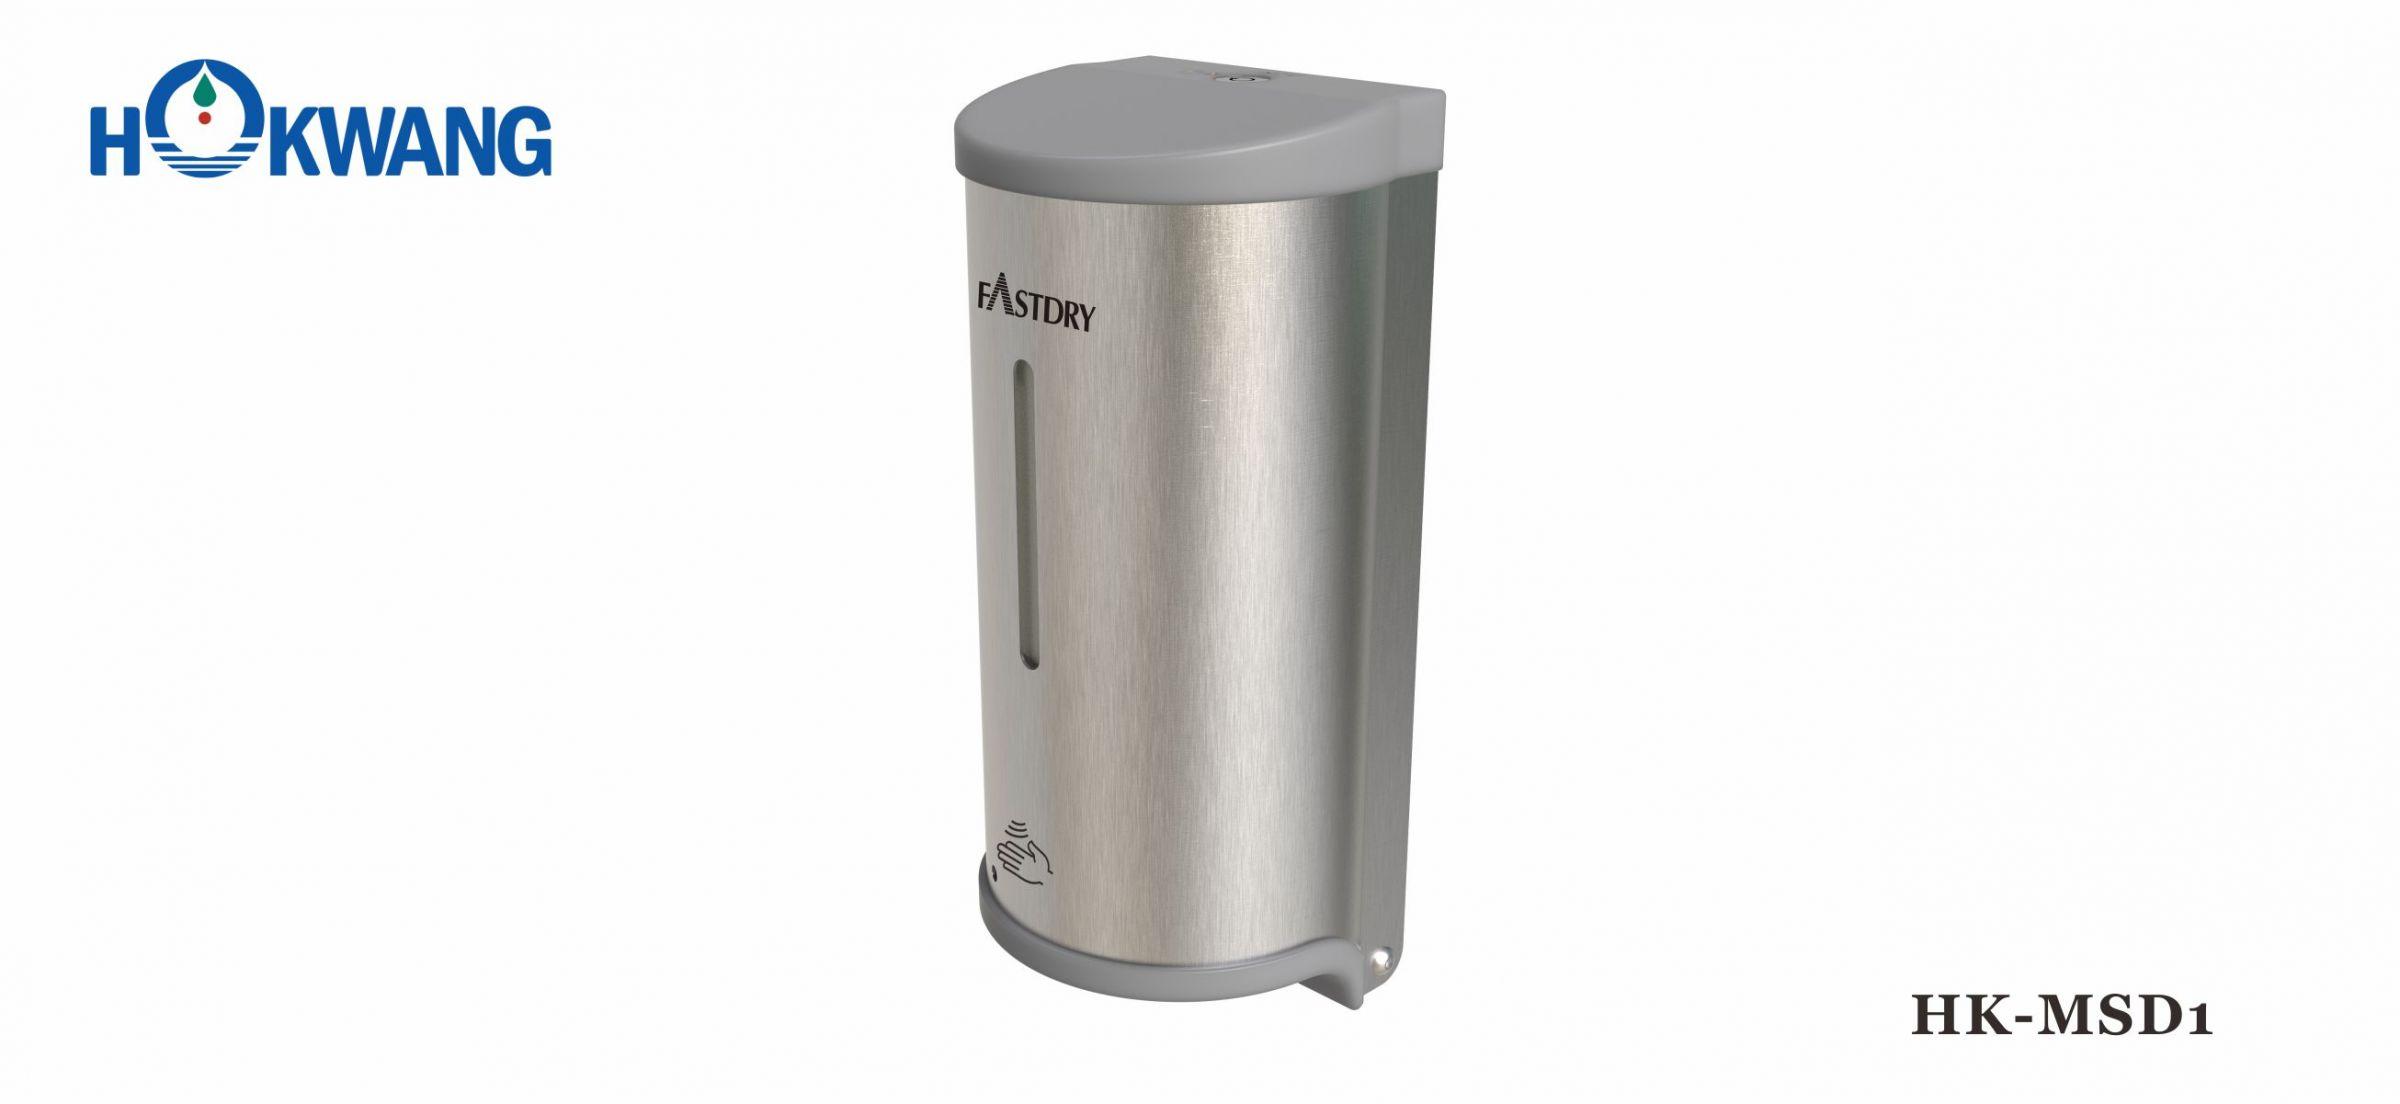 HK-MSD1自動ステンレス鋼多機能石鹸ディスペンサー